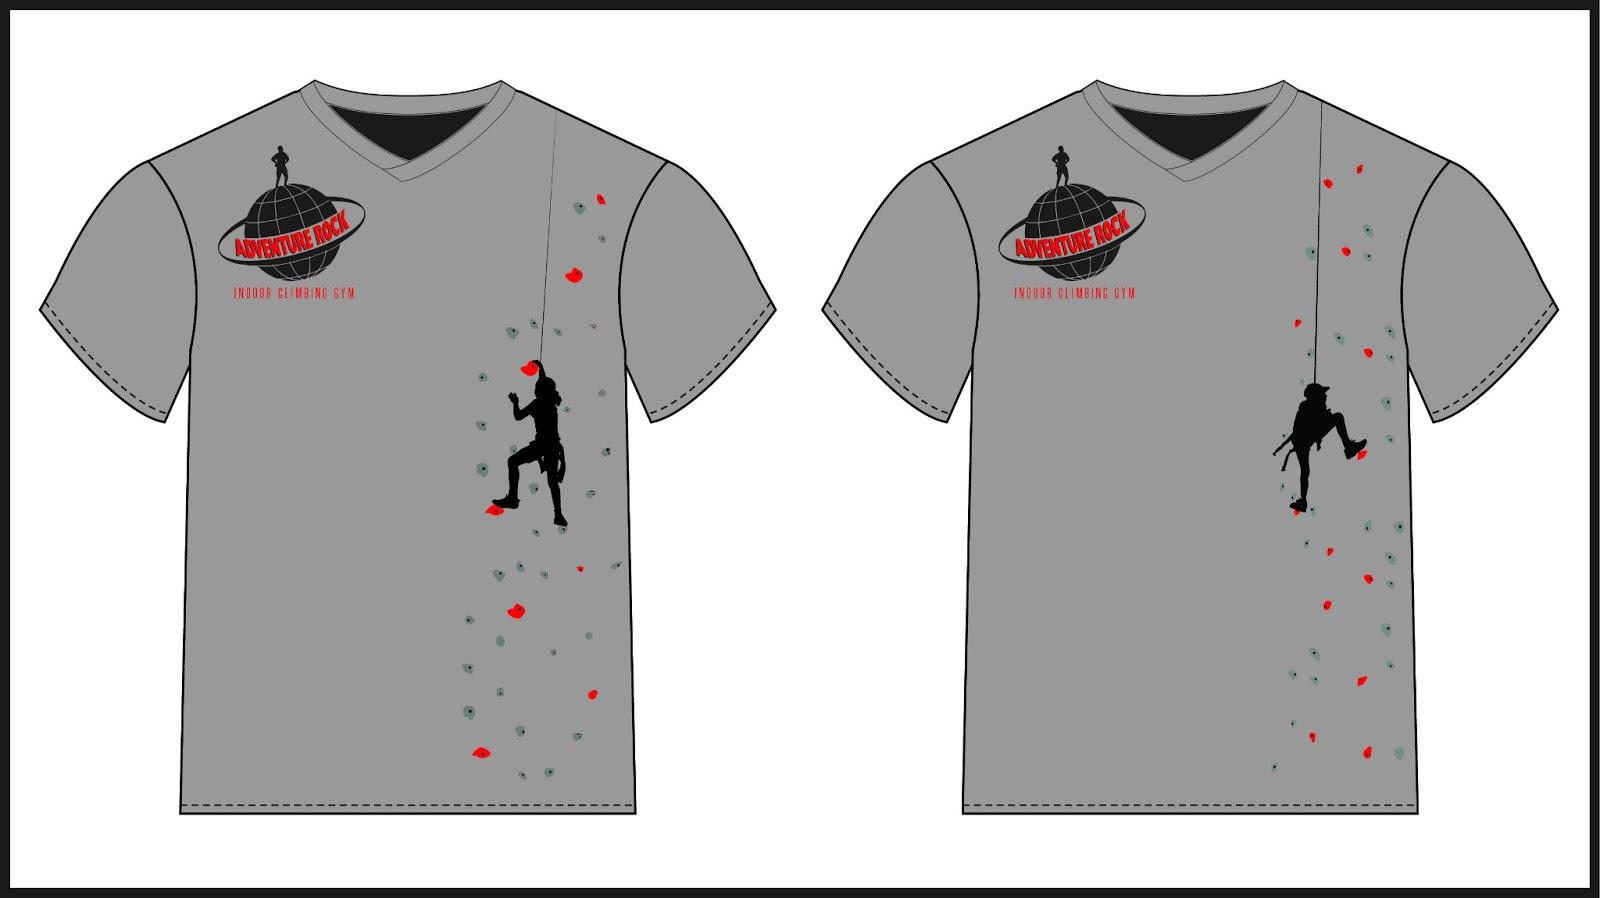 Creative tshirt designs octopus t shirt 50 most creative for T shirt creative design